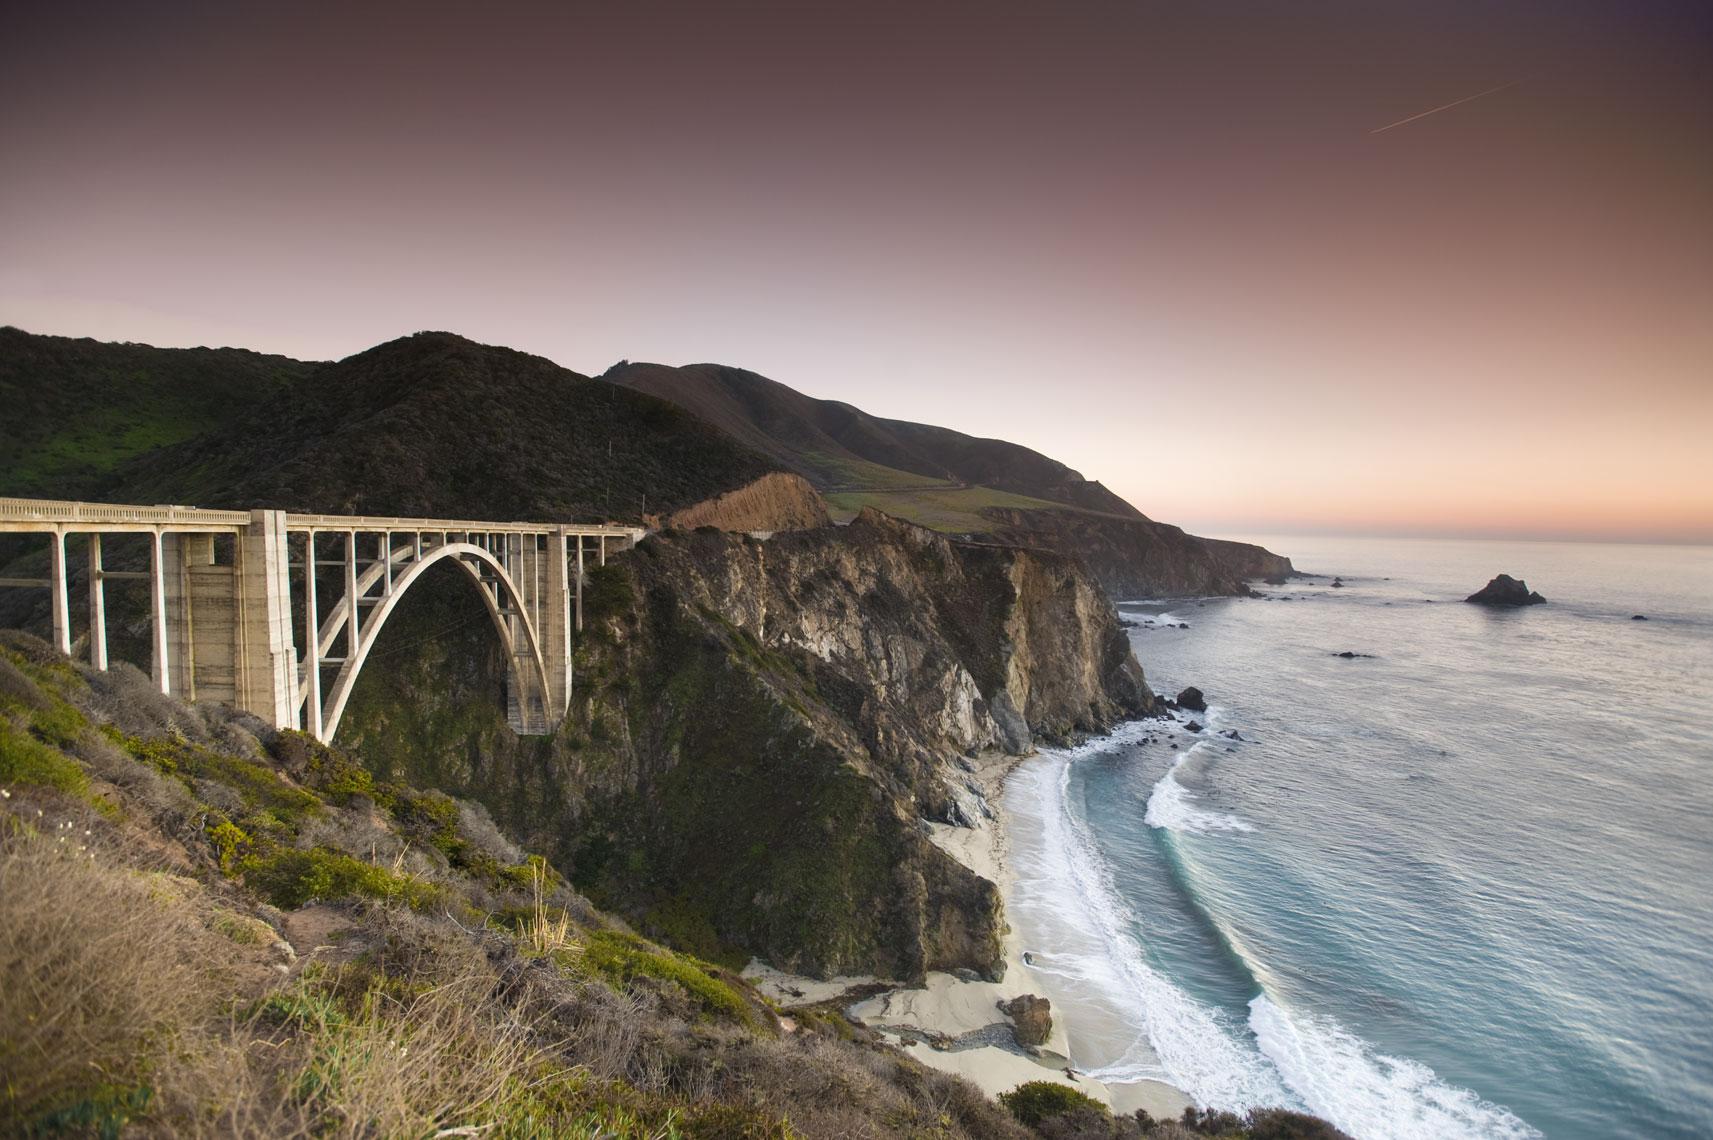 Bixby Bridge, Big Sur, by California landscape photographer Mike Morgan.